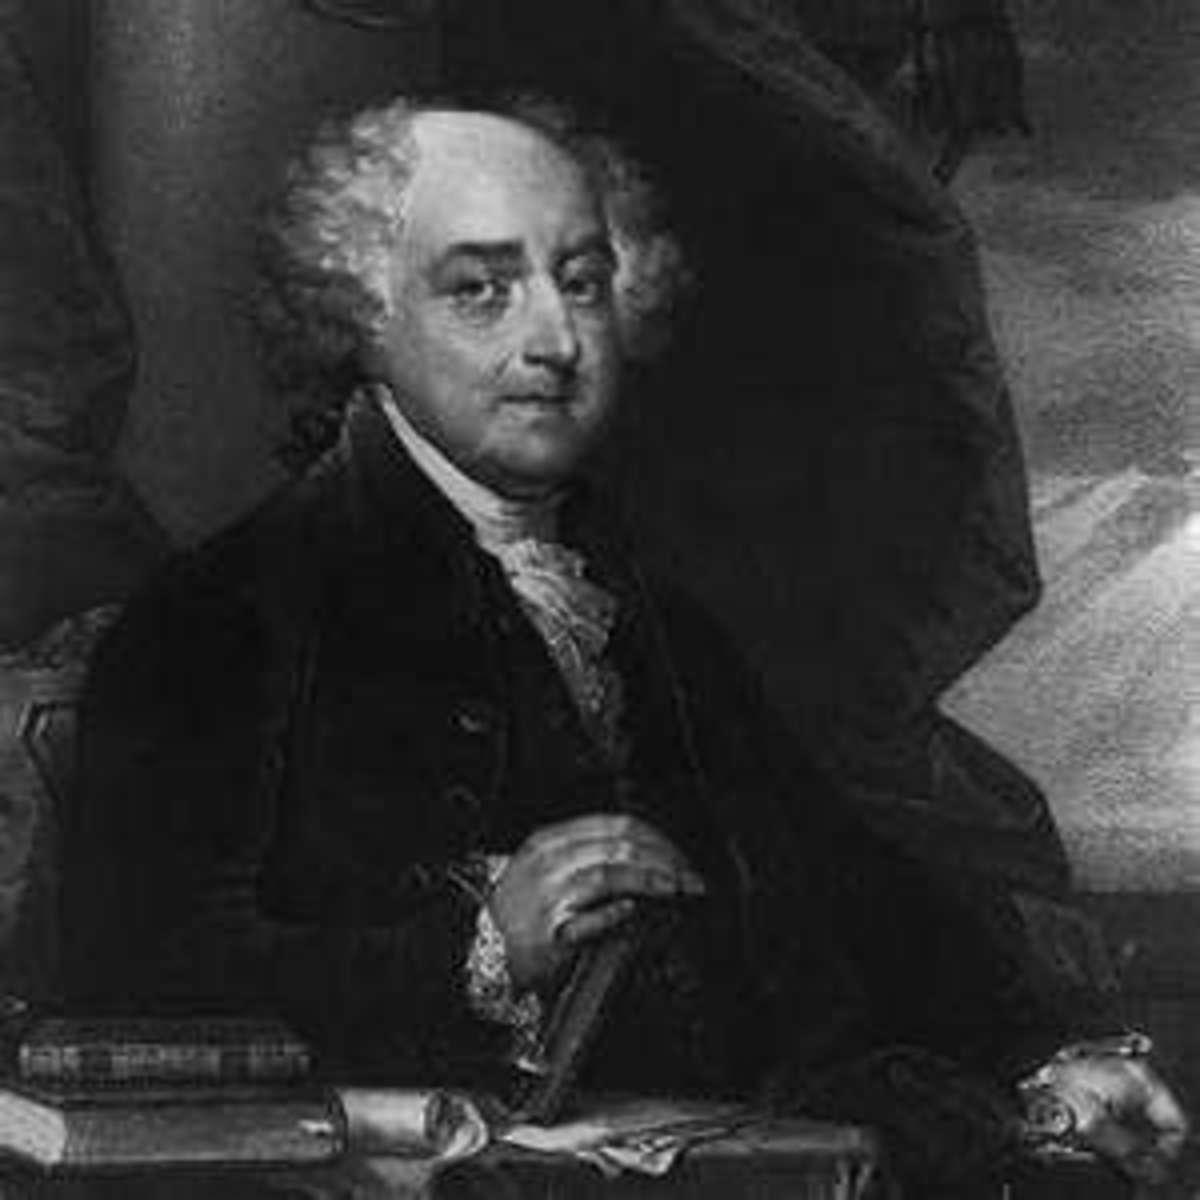 PRESIDENT JOHN ADAMS (b. 1735,   d. 1826), POTUS #2, 1797 - 1803